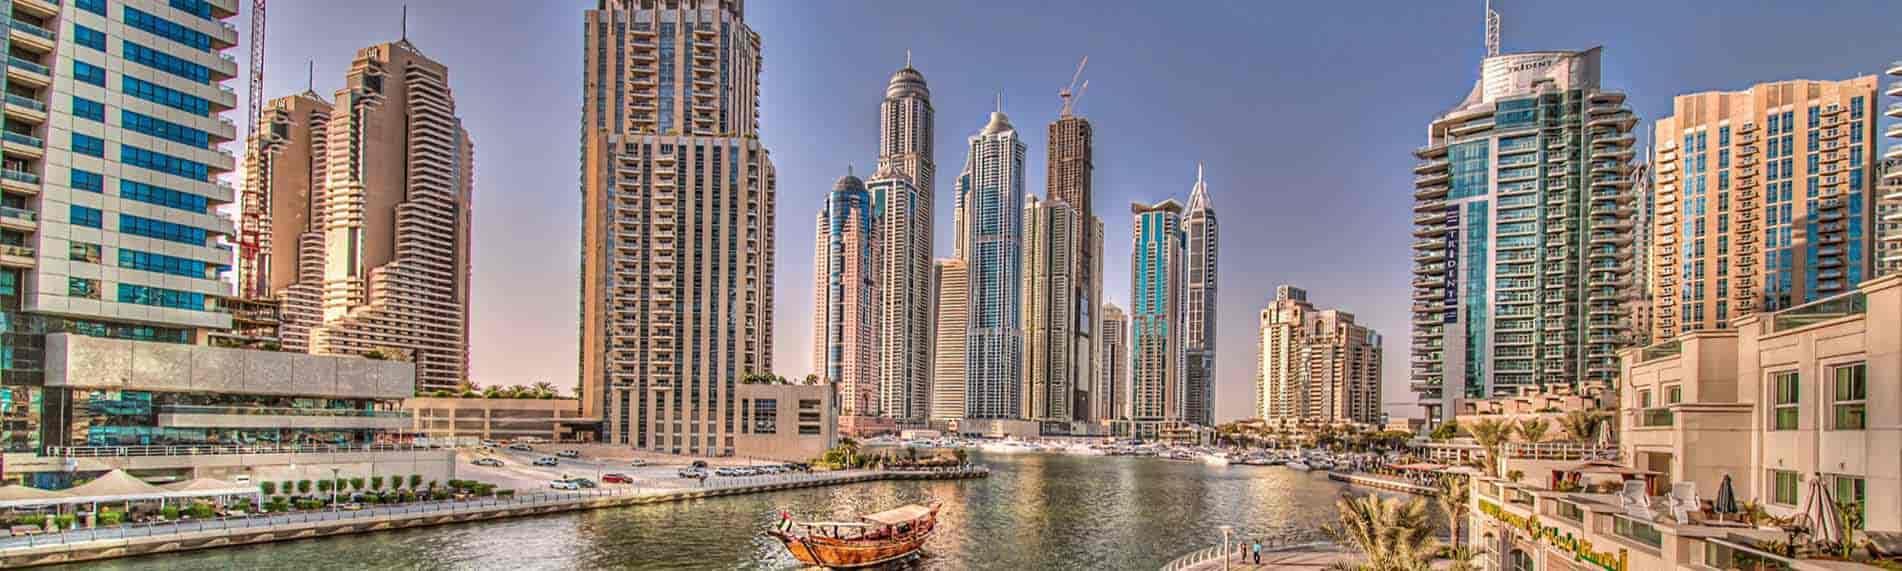 Grand Tour Dubai 8 Nights